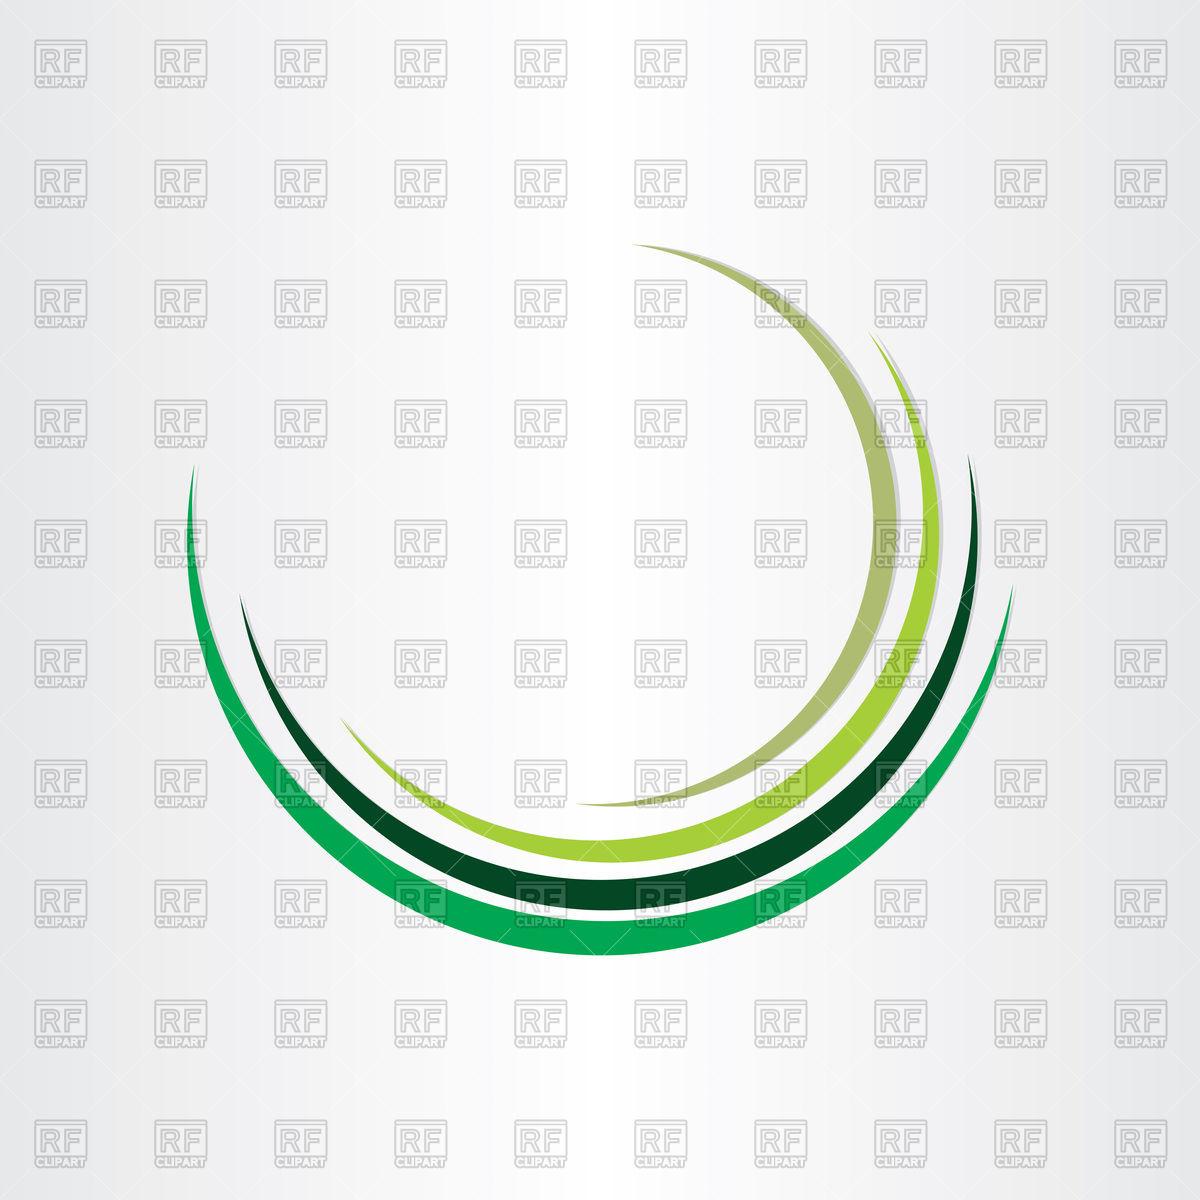 1200x1200 Green Half Circle Design Vector Image Vector Artwork Of Design